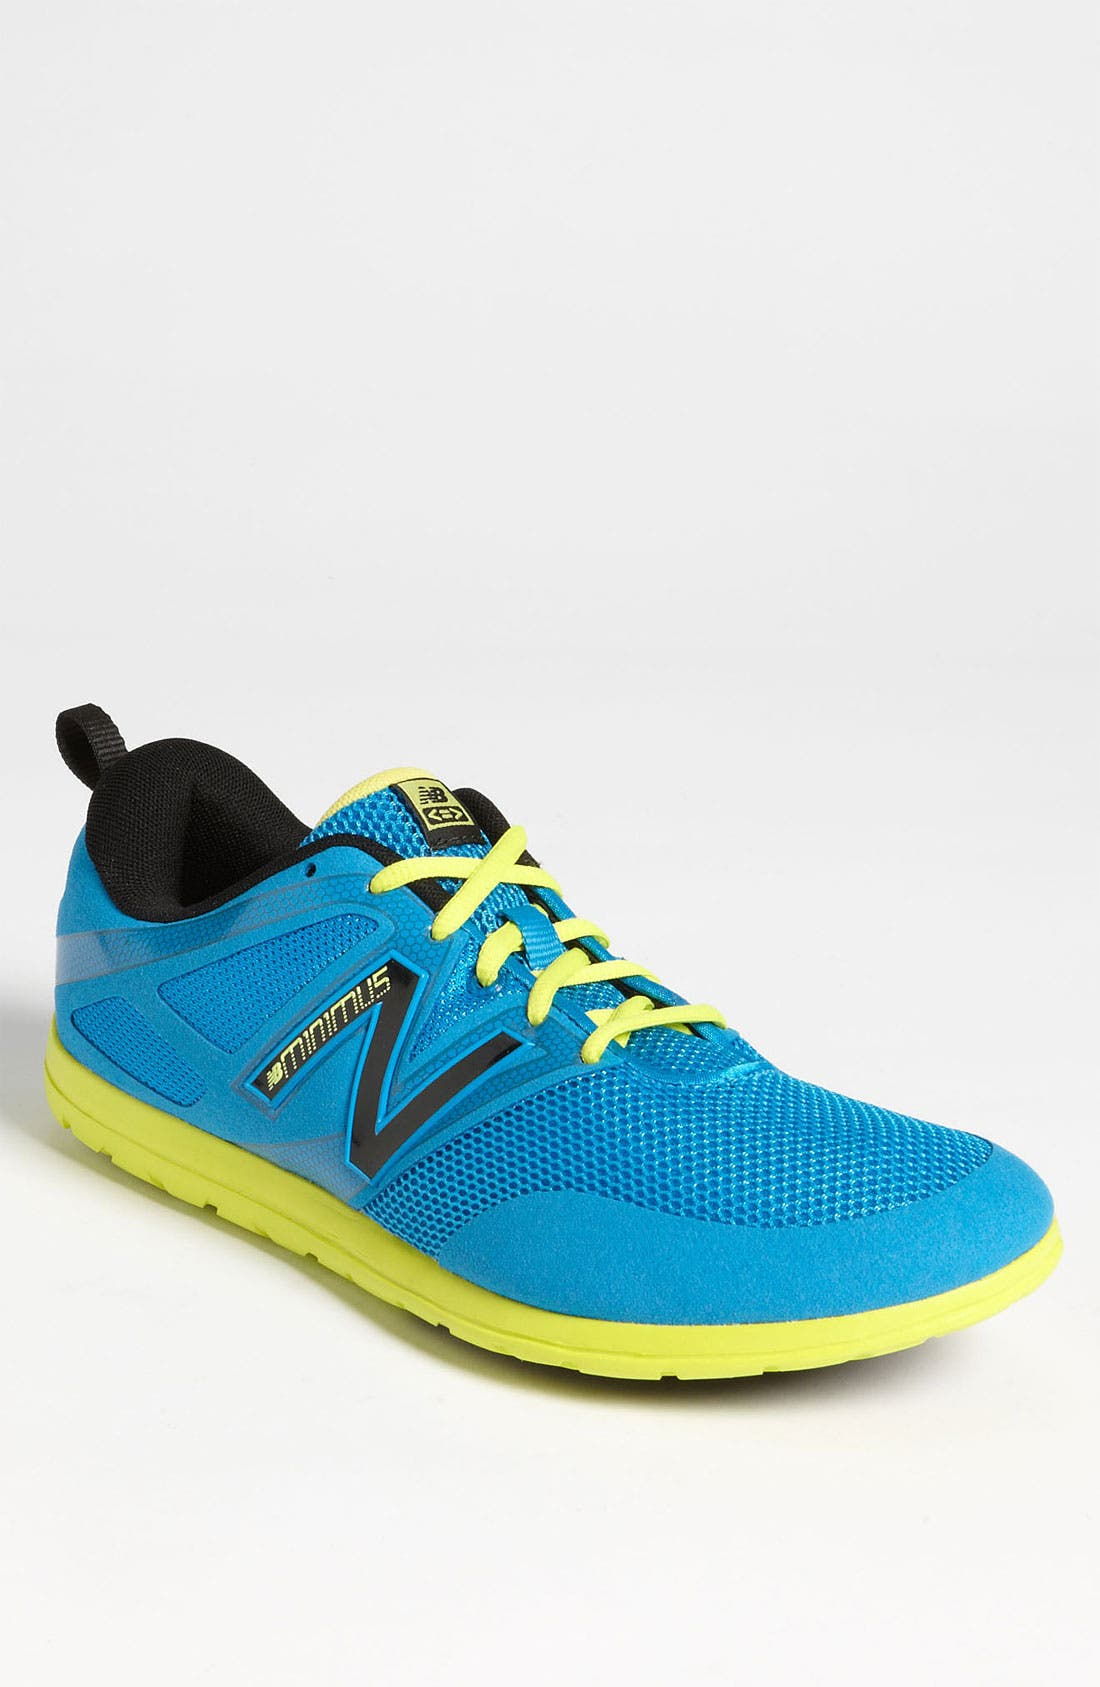 Main Image - New Balance 'MX20 Minimus' Training Shoe (Men)